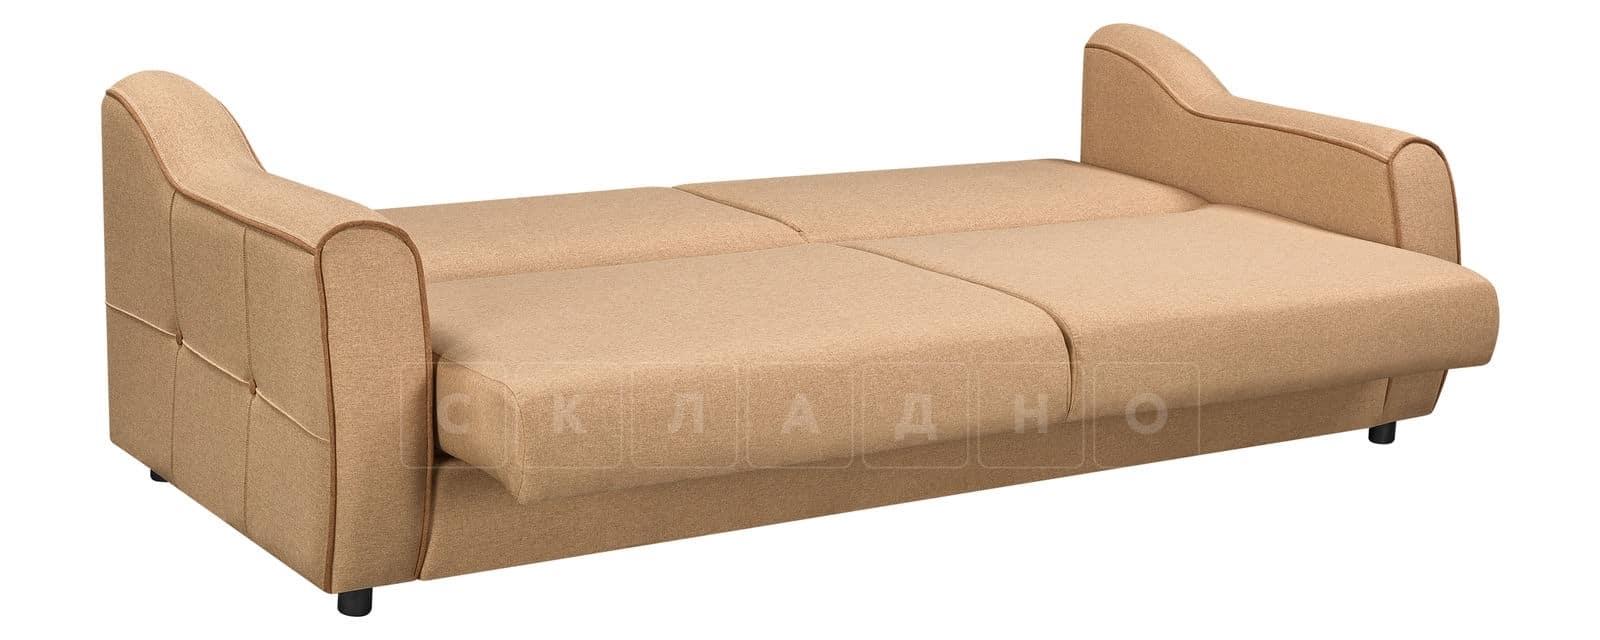 Диван Флэтфорд рогожка бежевый цвет фото 3 | интернет-магазин Складно